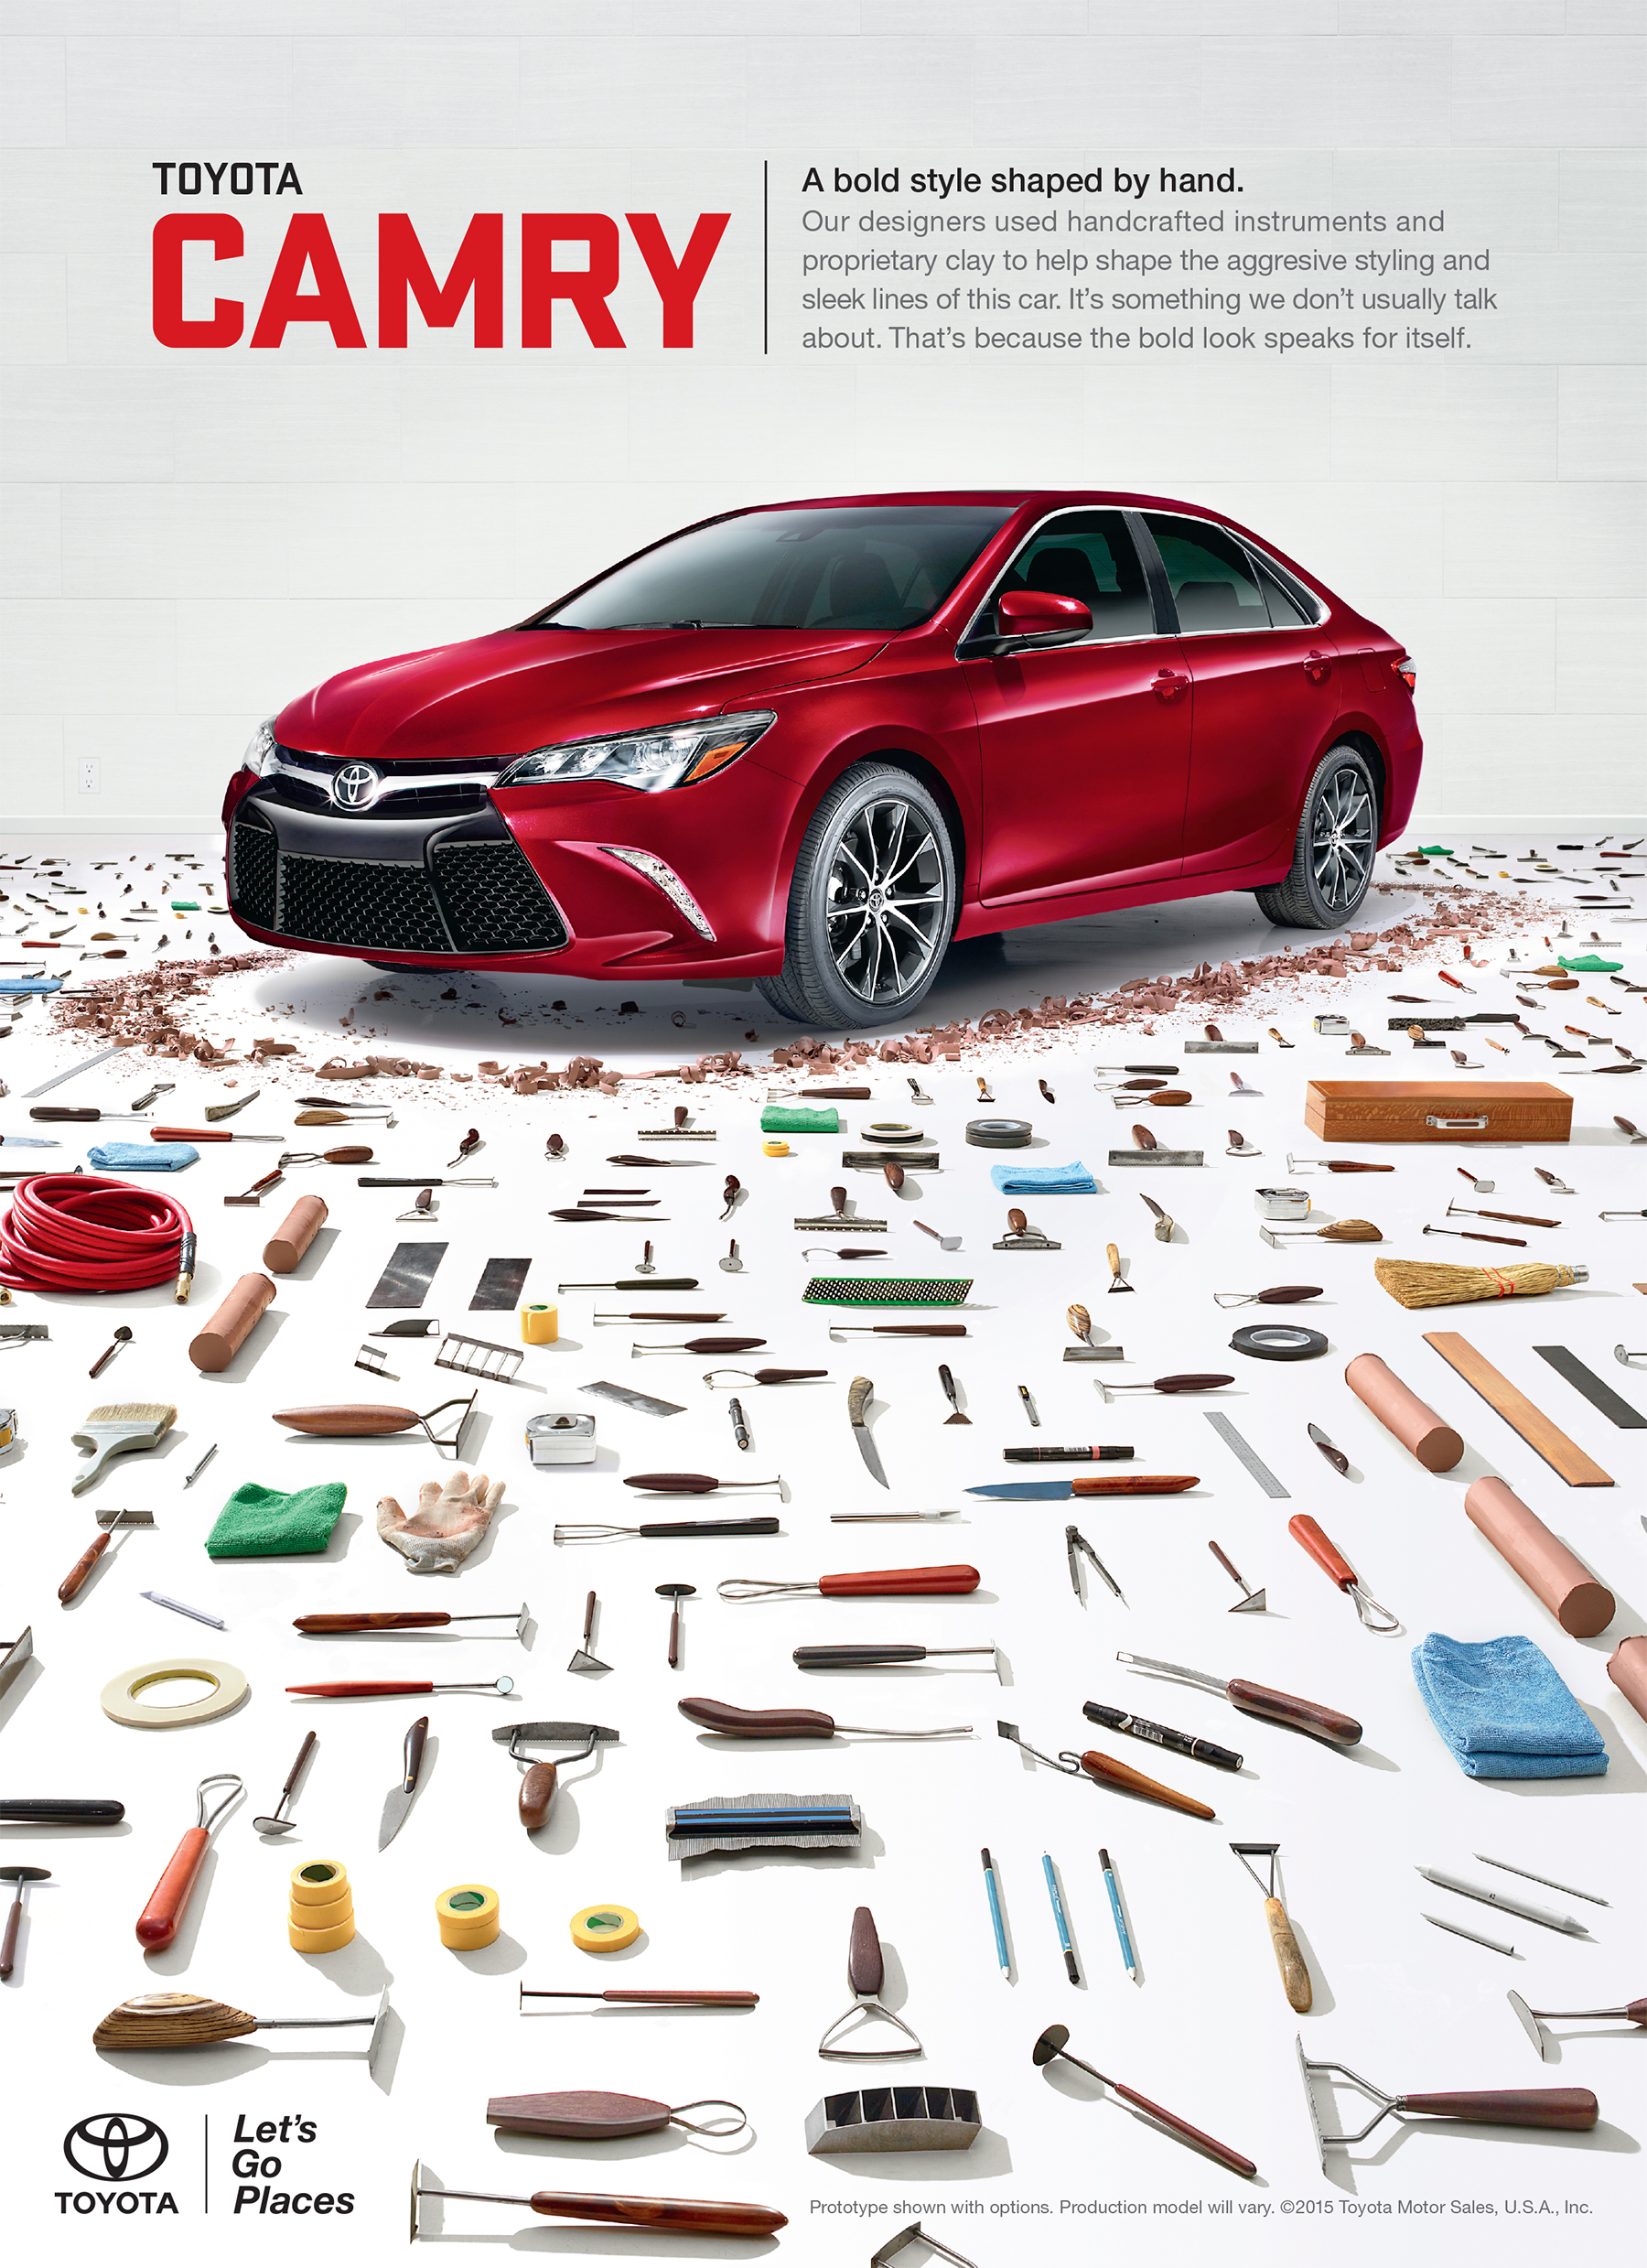 ToyotaCamryTools.jpg